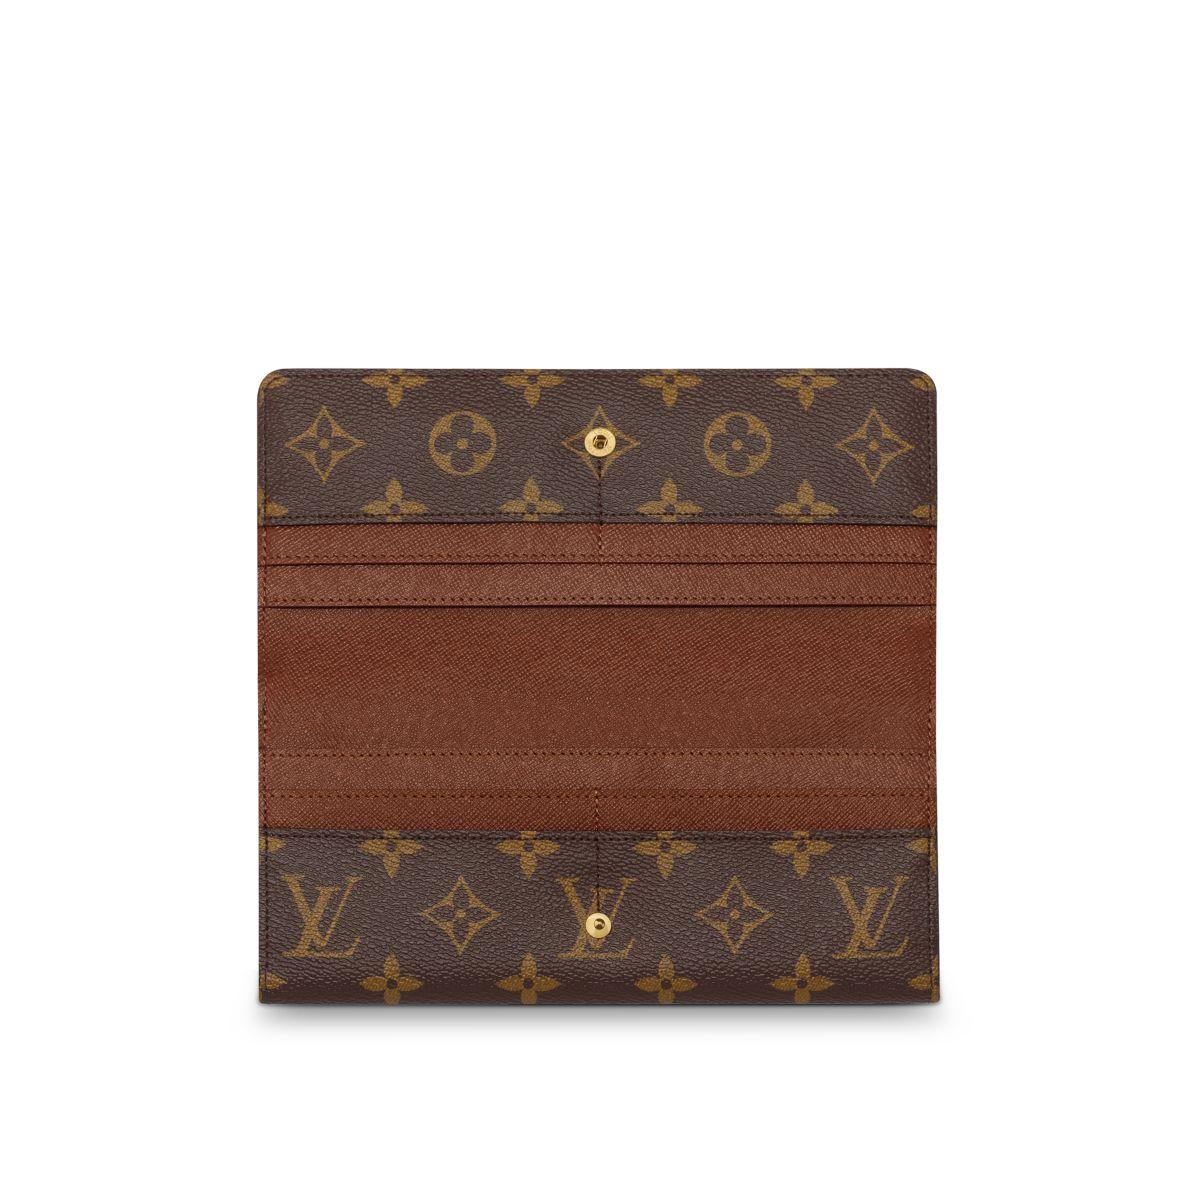 louis vuitton louise wallet in brown lyst